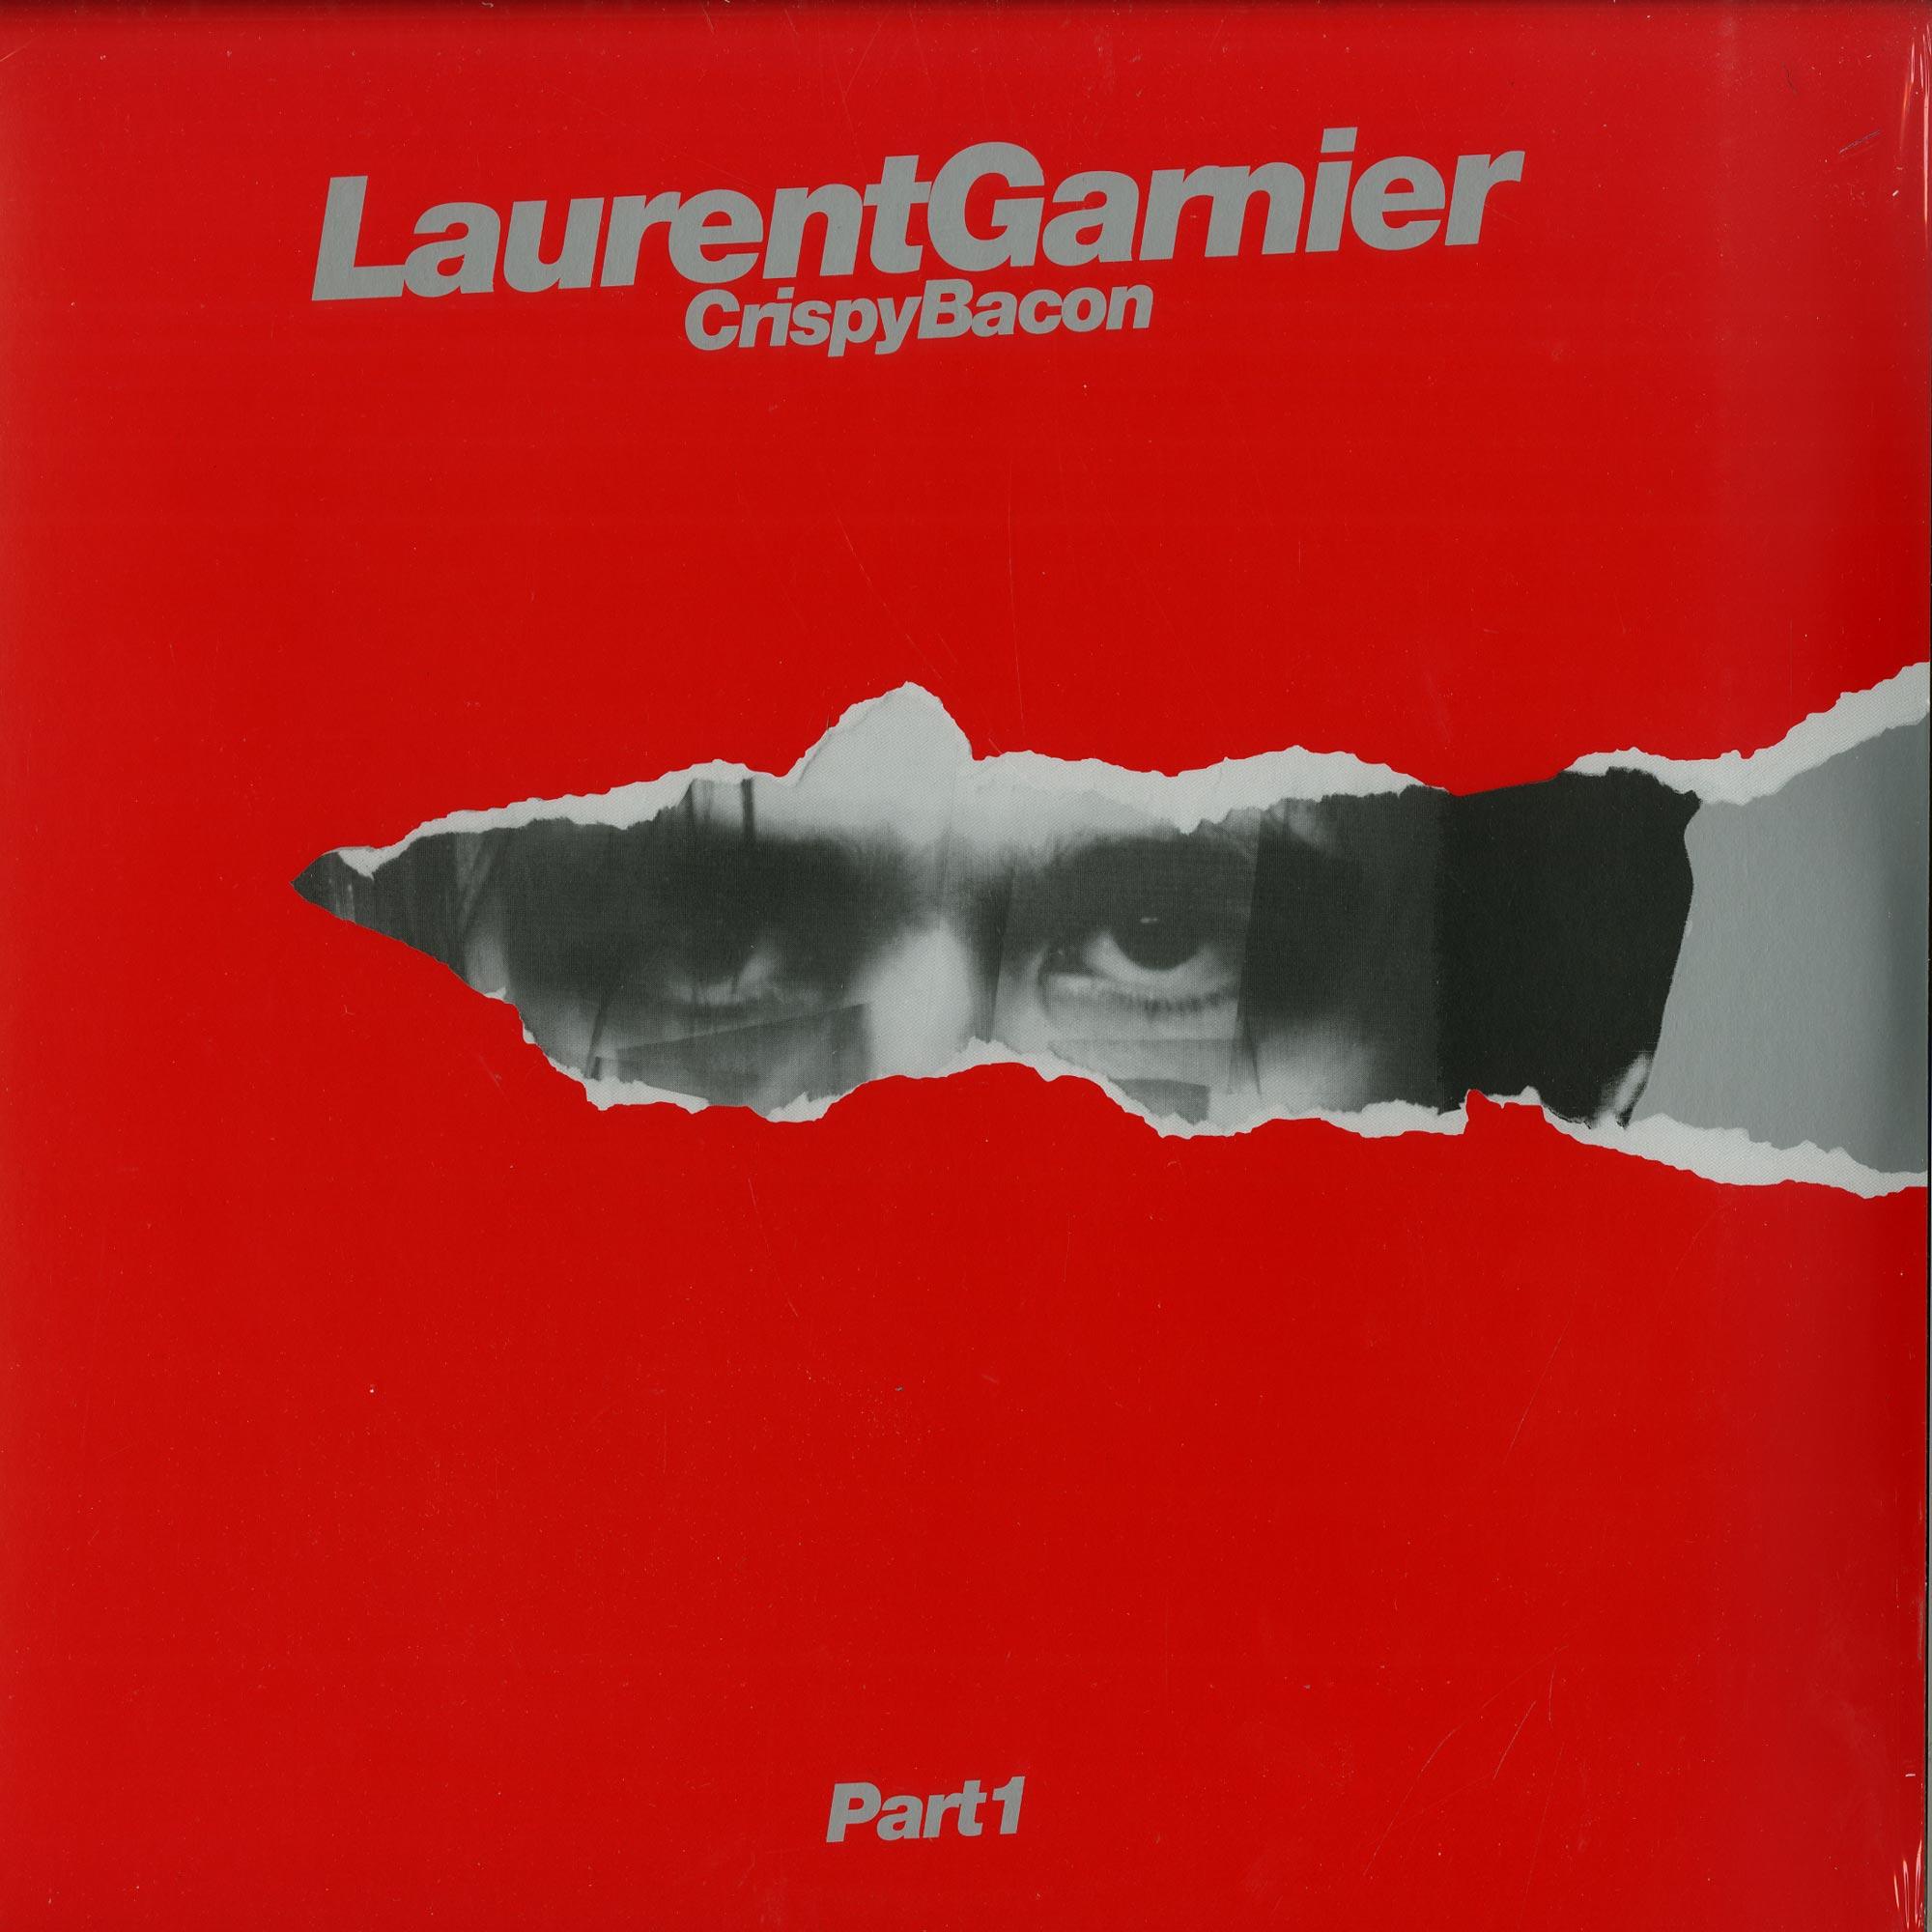 Laurent Garnier - CRISPY BACON PART 1